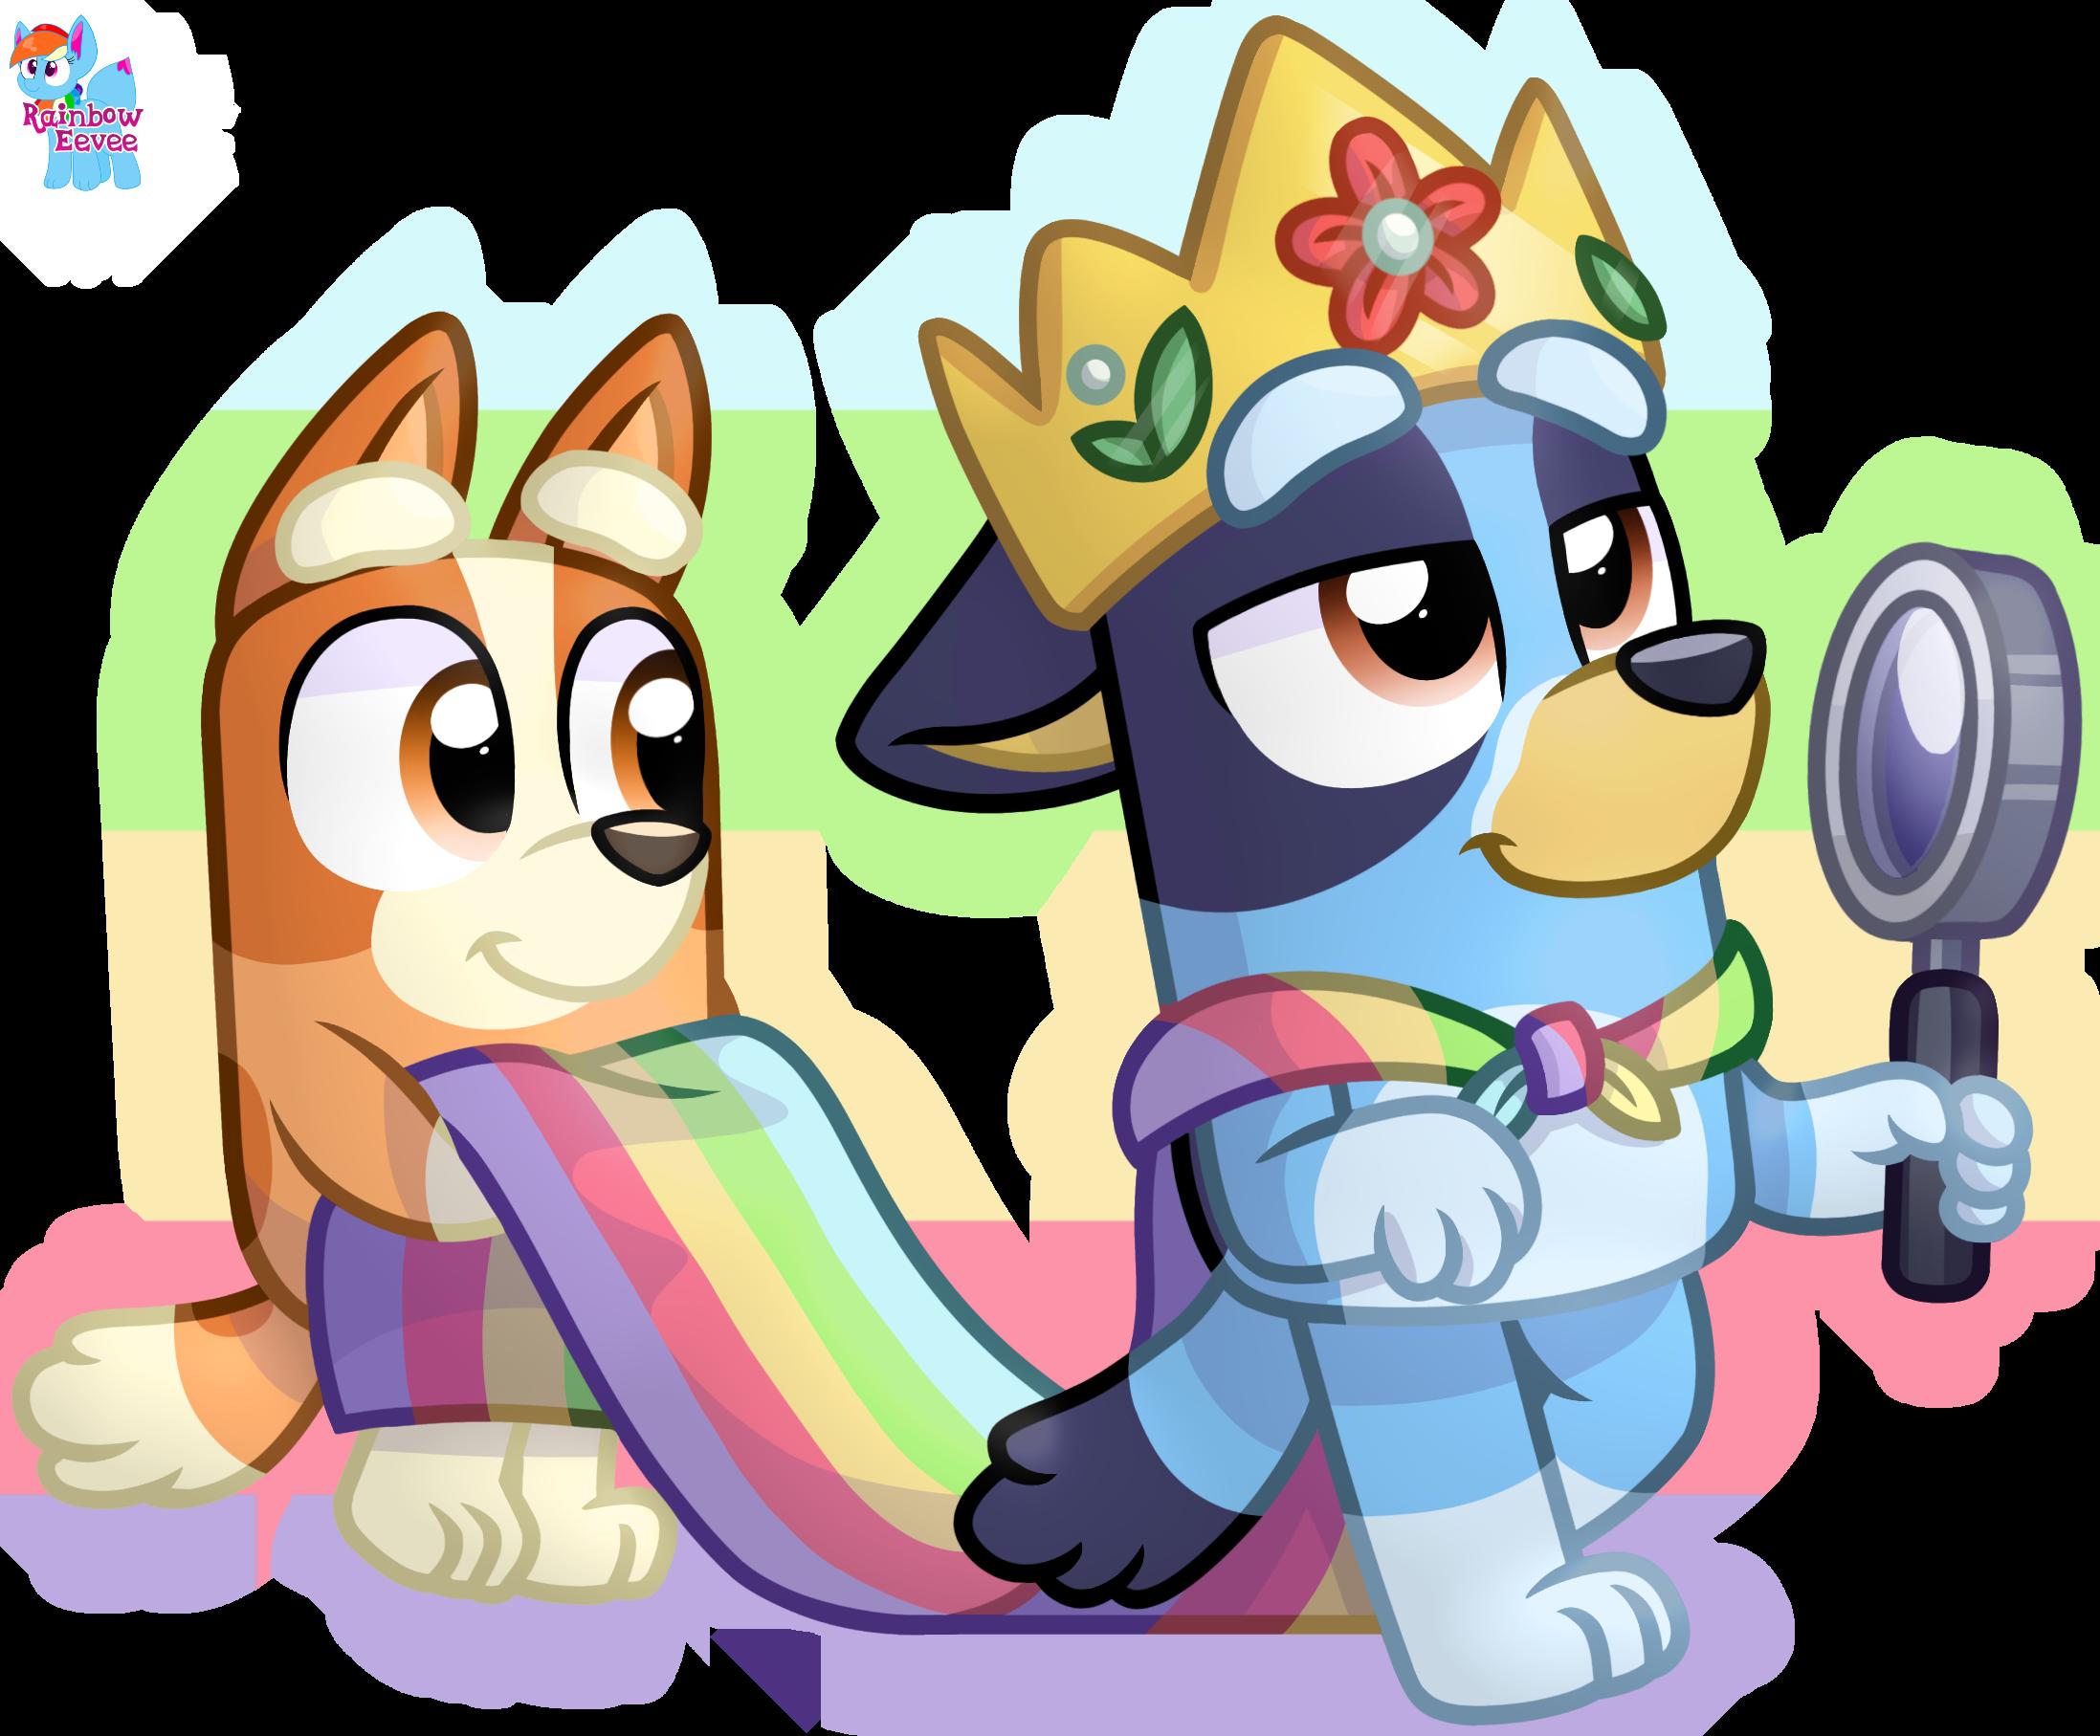 Queen Bluey And Bingo Sticker By Rainboweeveede On Newgrounds Character Design Kids Shows Cartoon